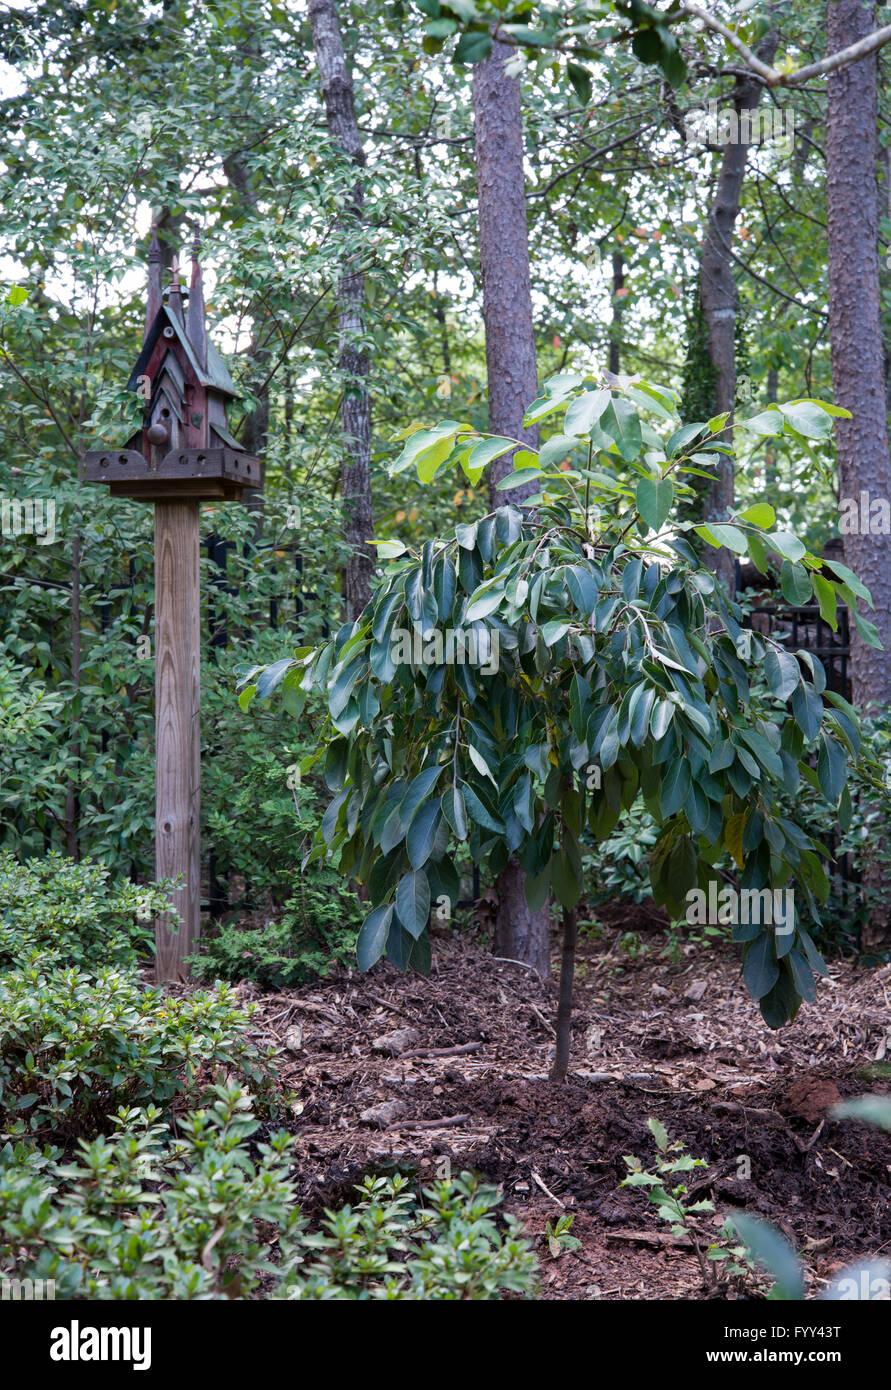 Diospyros virginiana, Fontaine Magique,arbre pleureur, Persimmon Photo Stock